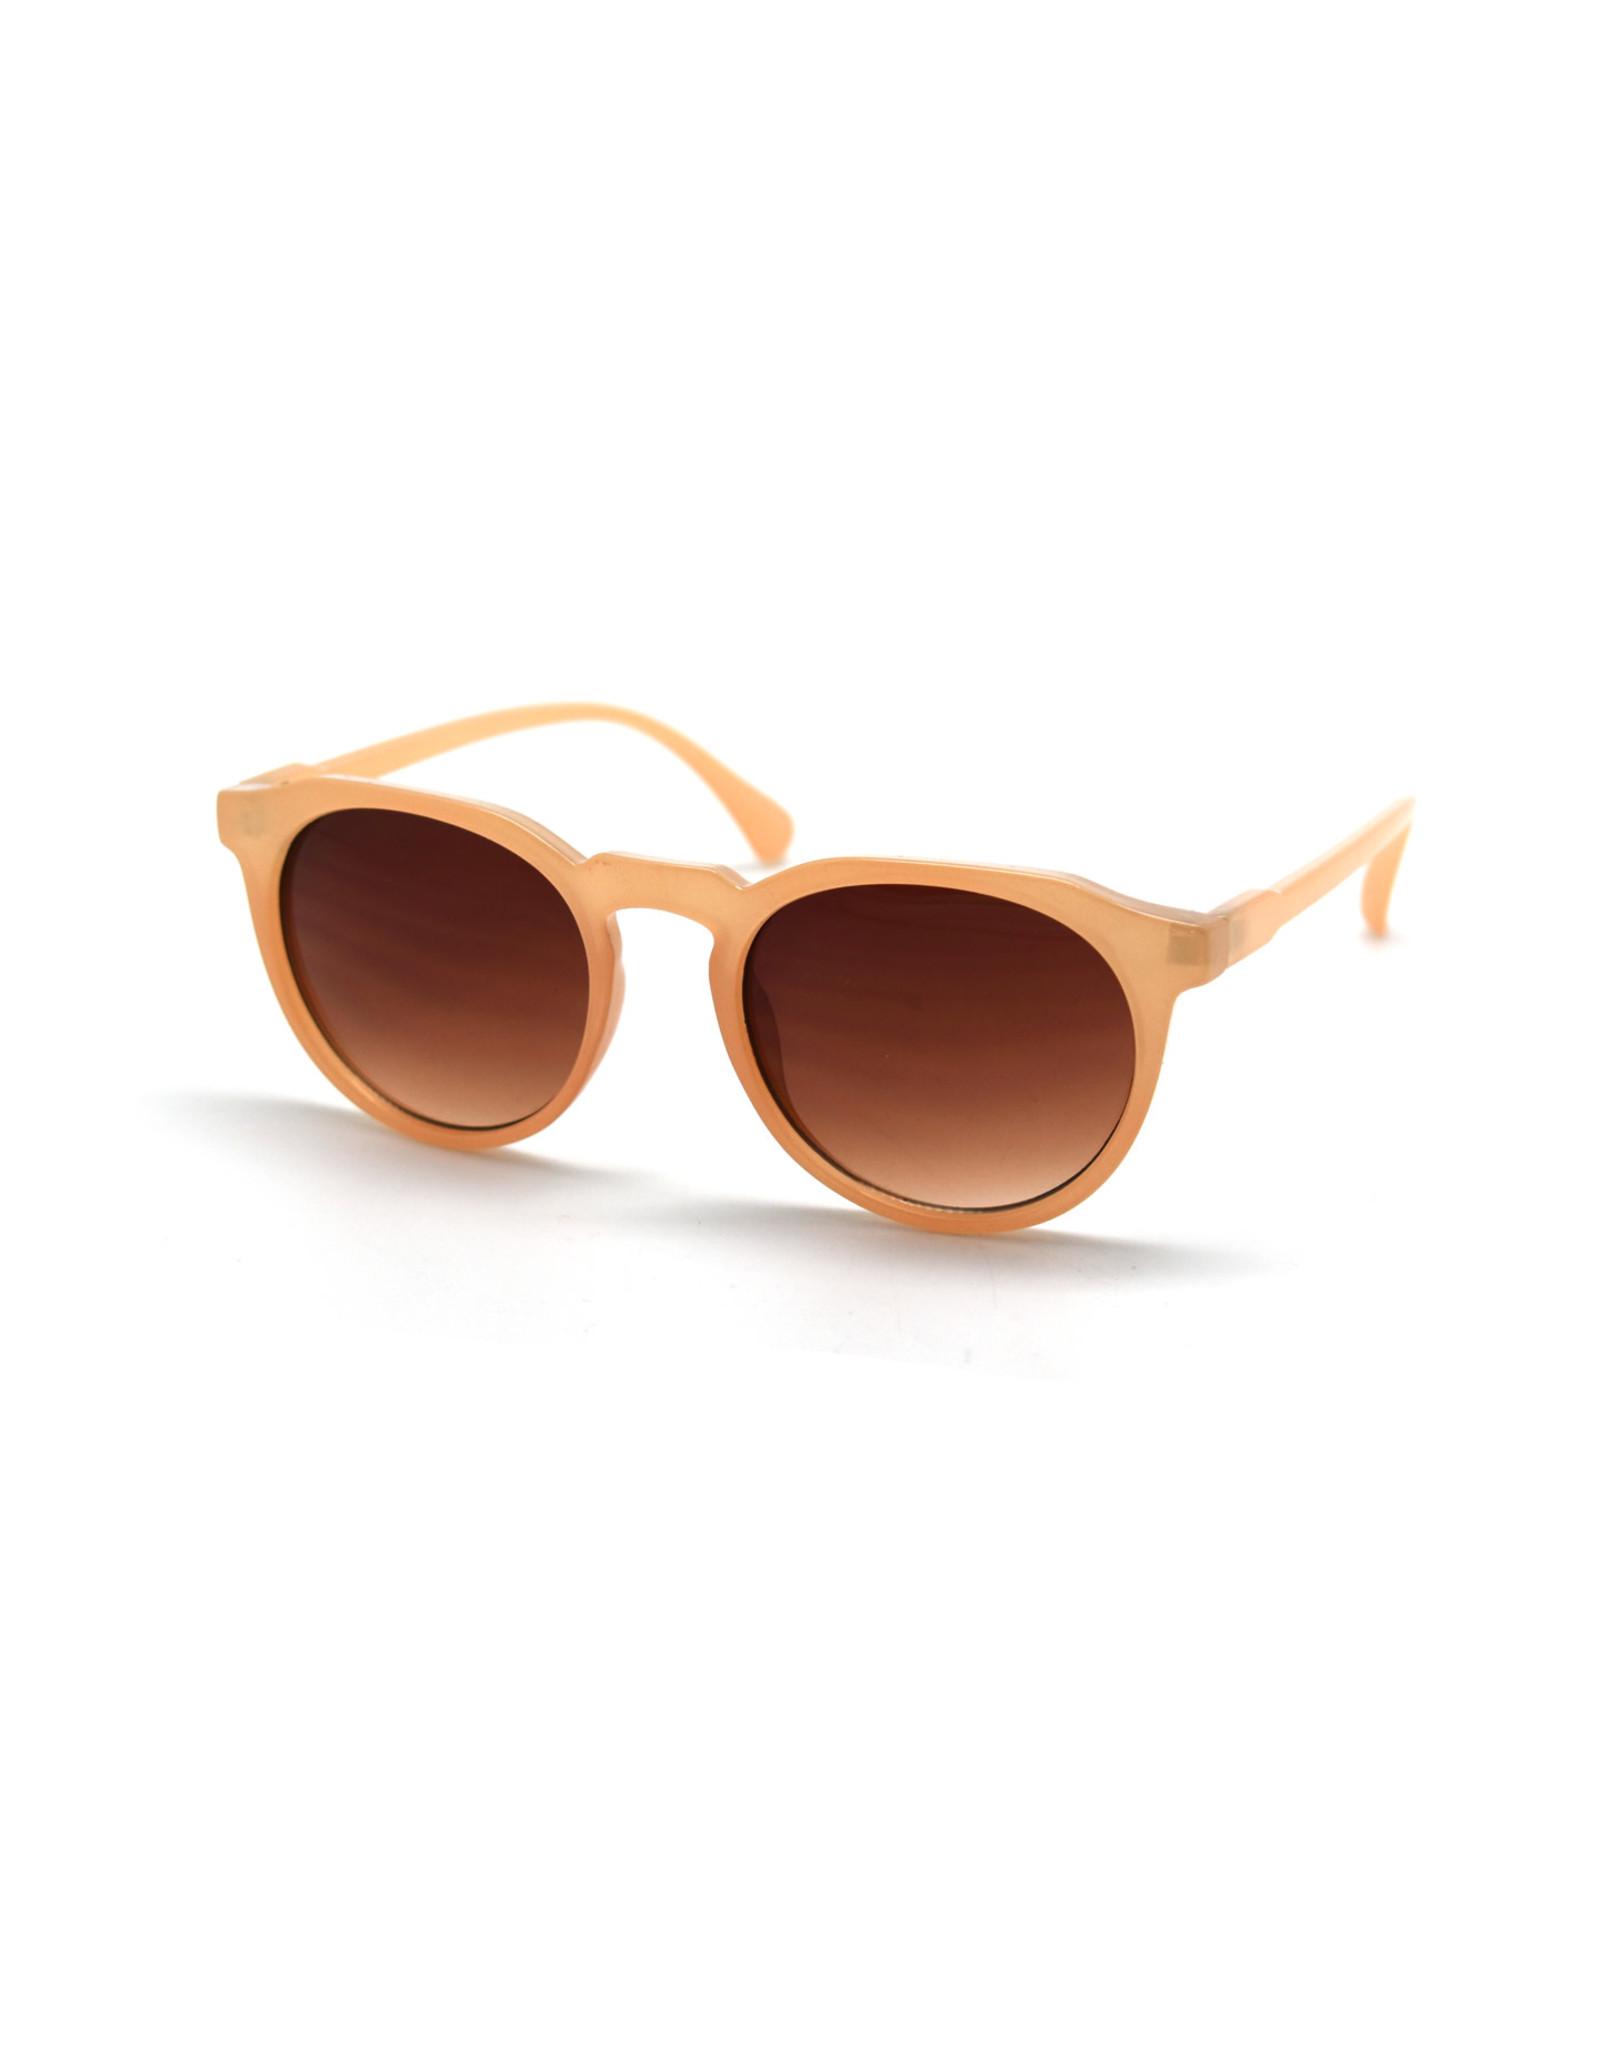 Peach Bellini Sunglasses